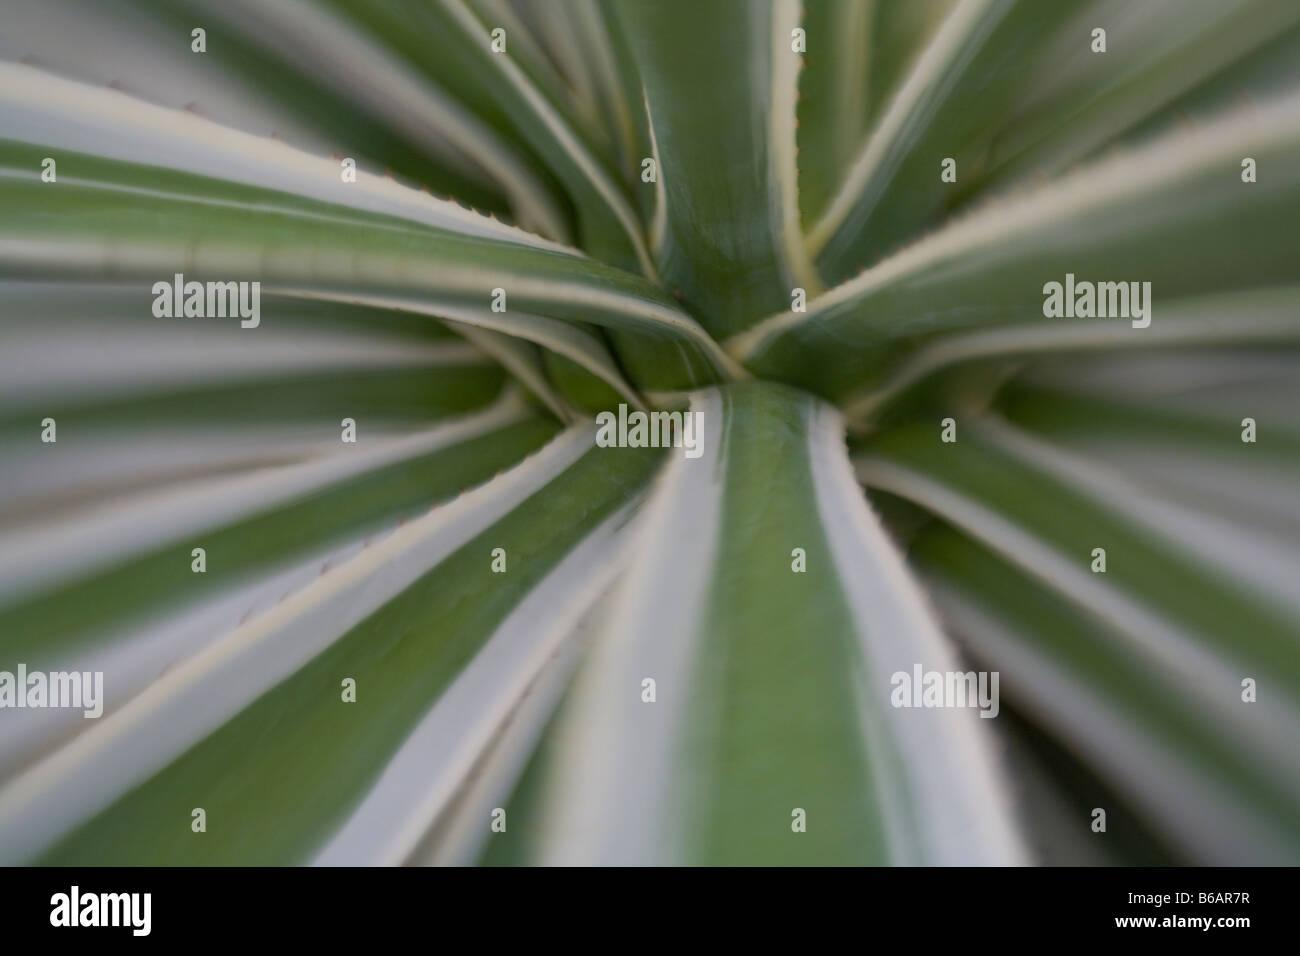 Closeup details of cactus - Stock Image